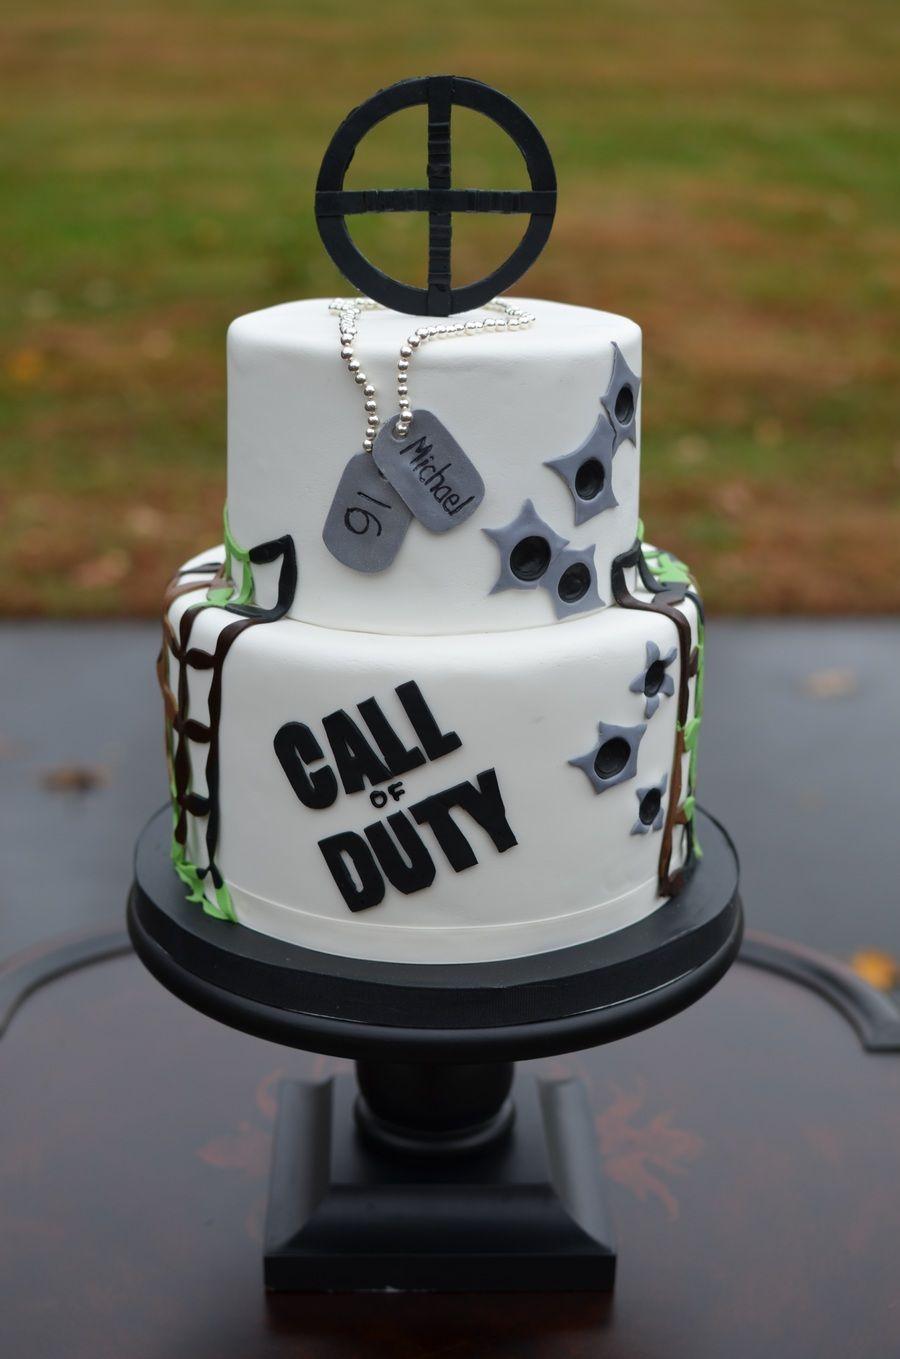 Call Of Duty Birthday Cake cakescupcakes Pinterest Birthday